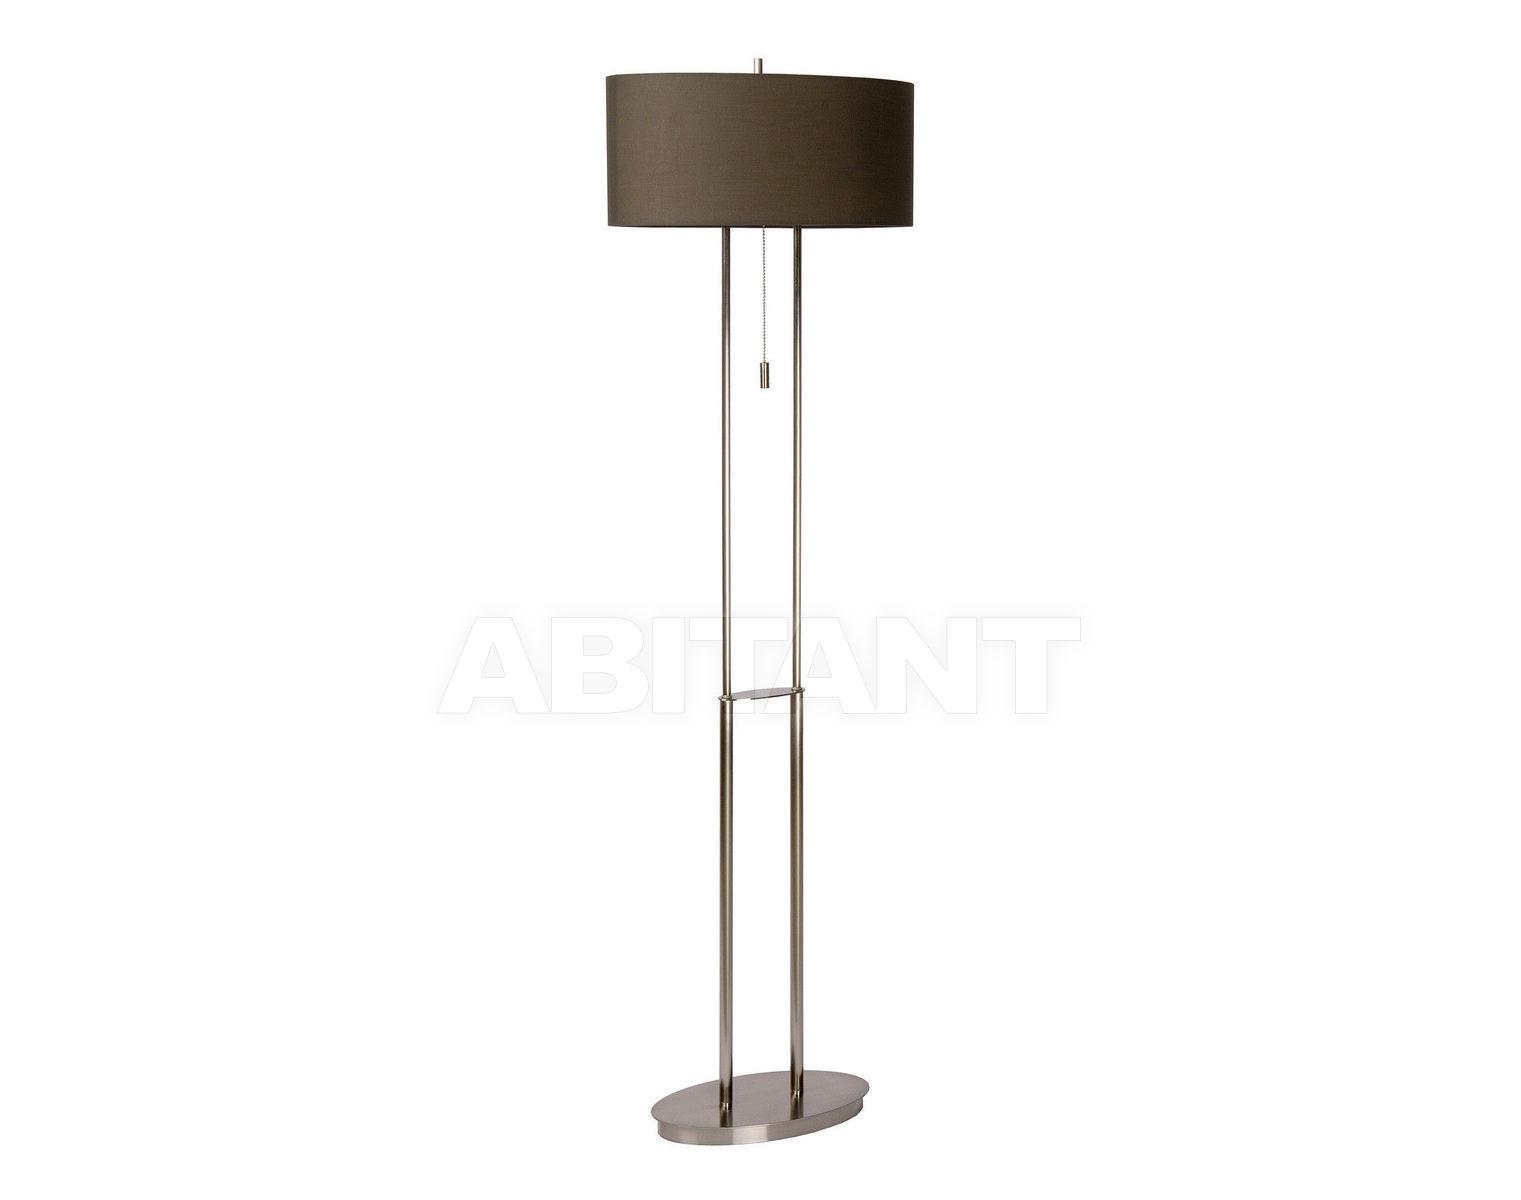 Floor lamp elips brown lucide 19747 02 12 buy rder for Buy floor lamp with table